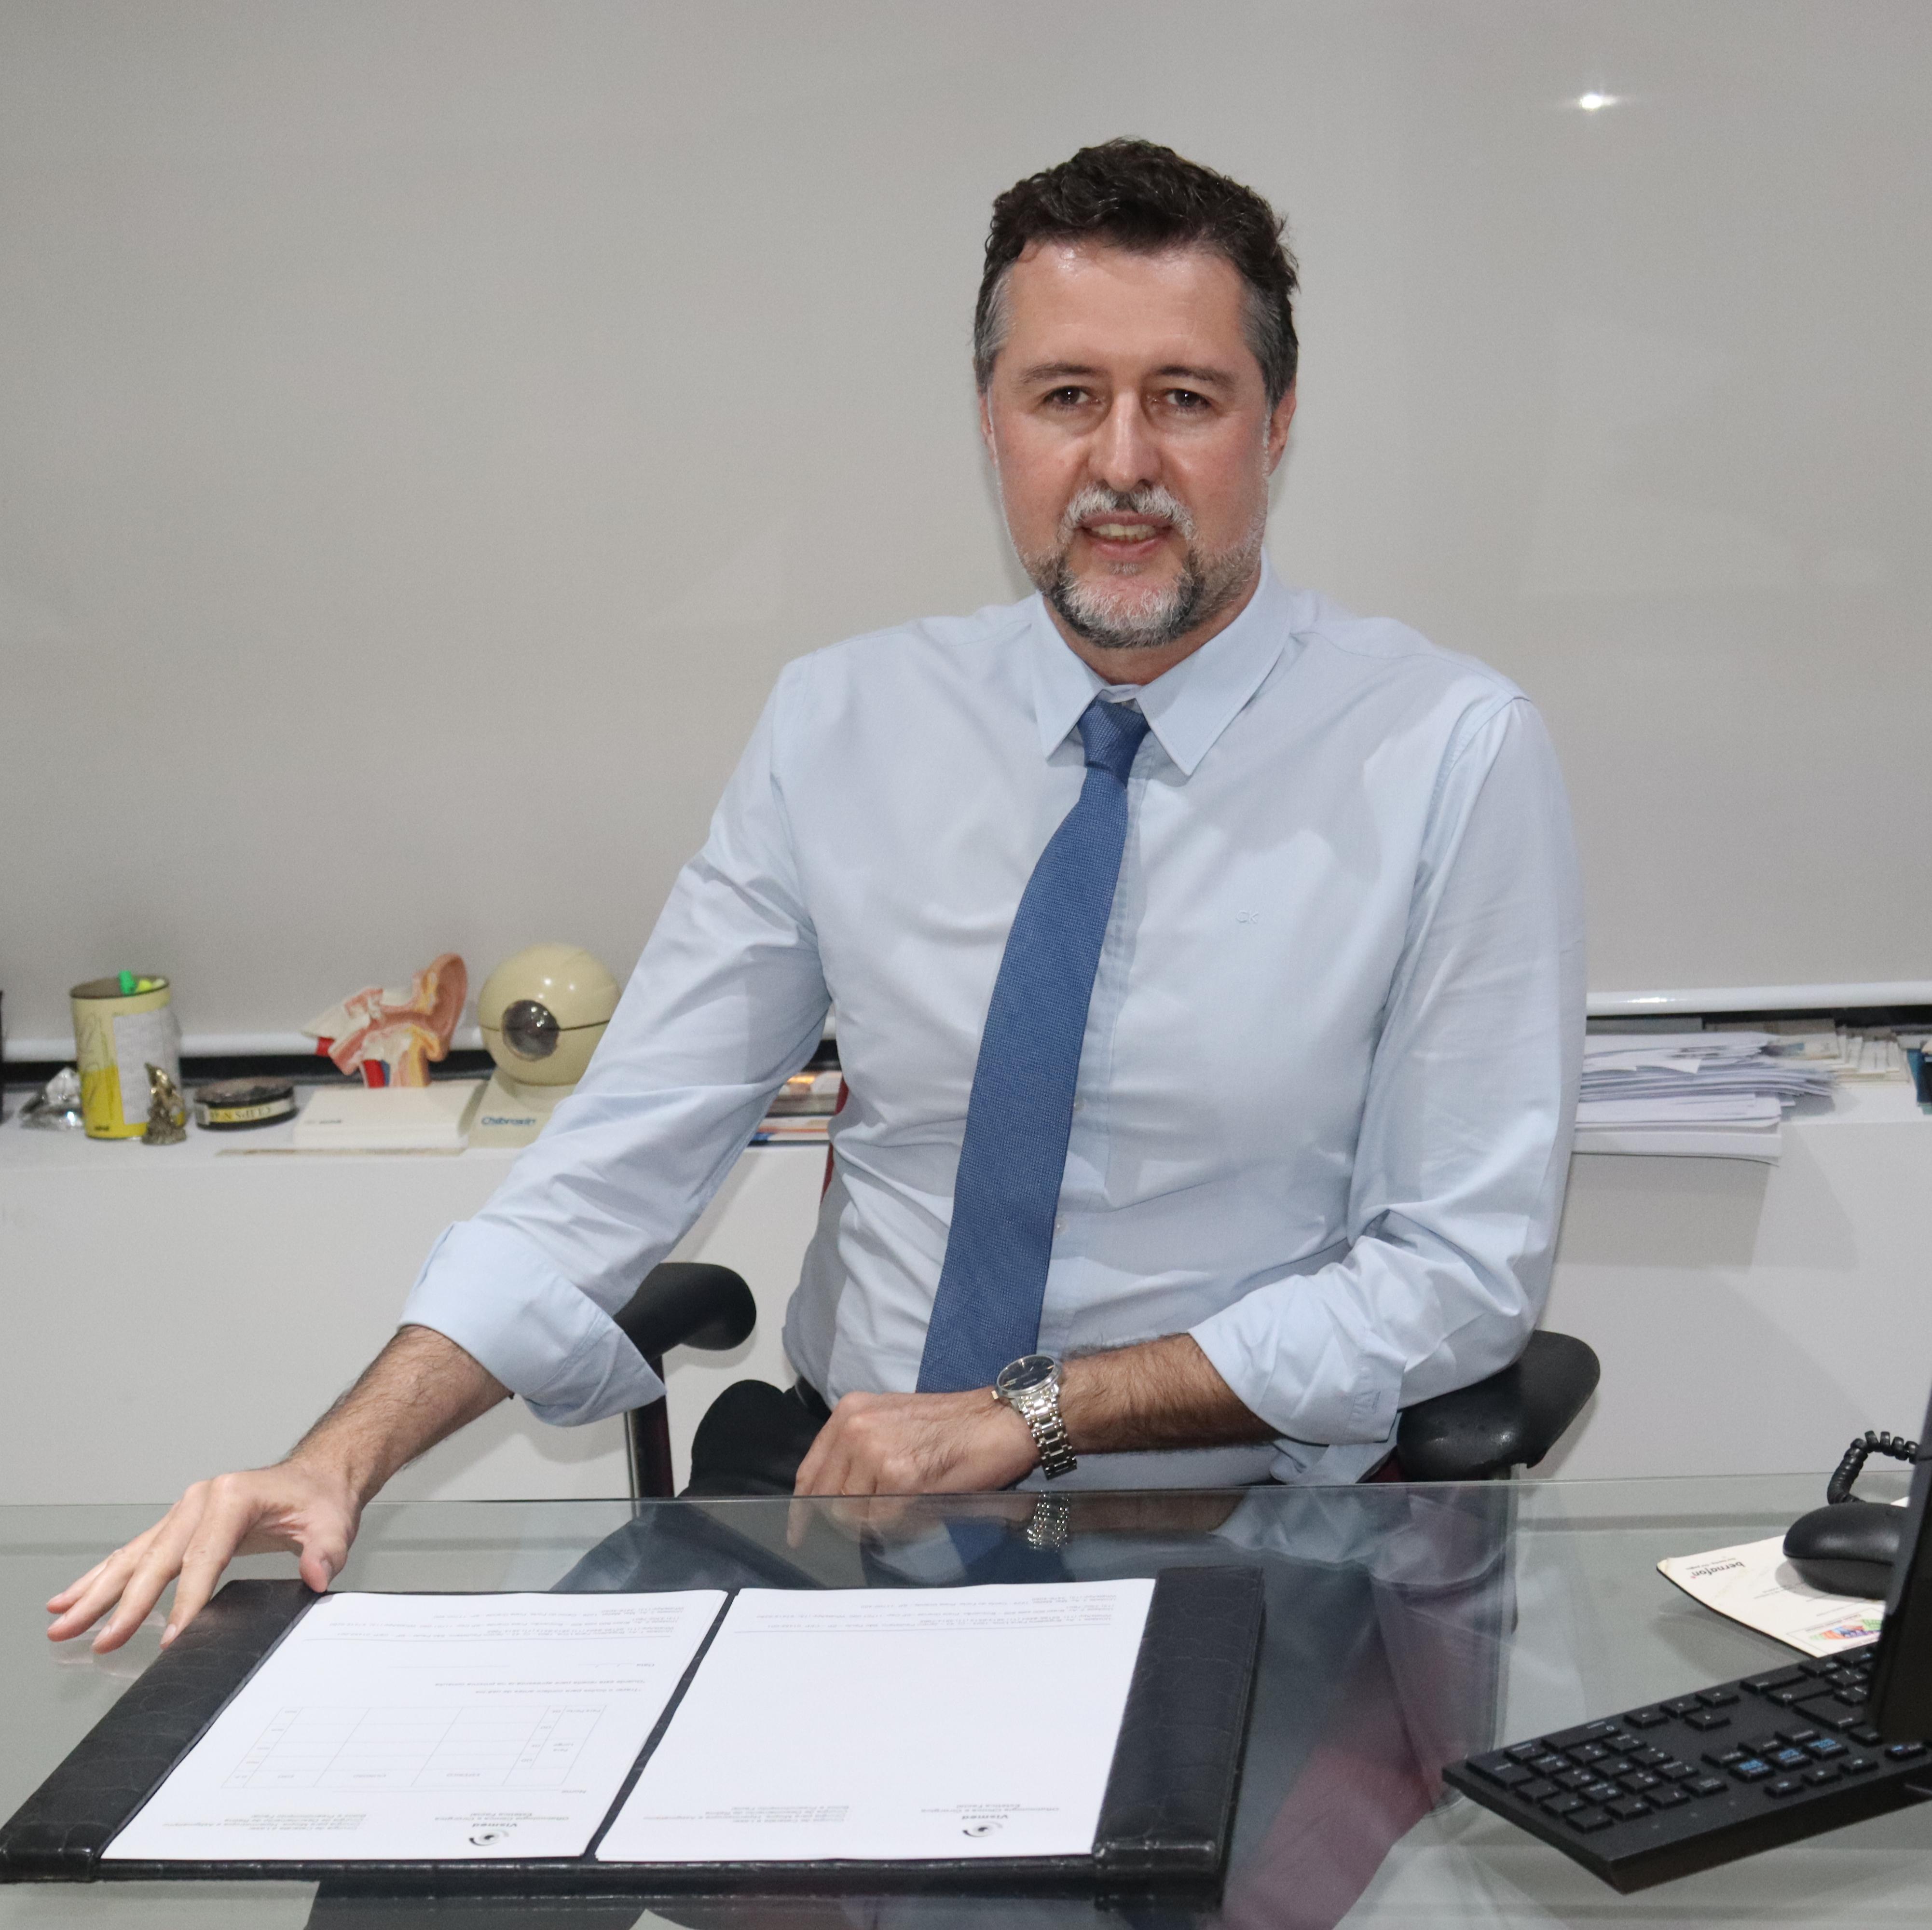 Pedro Durães Serracarbassa